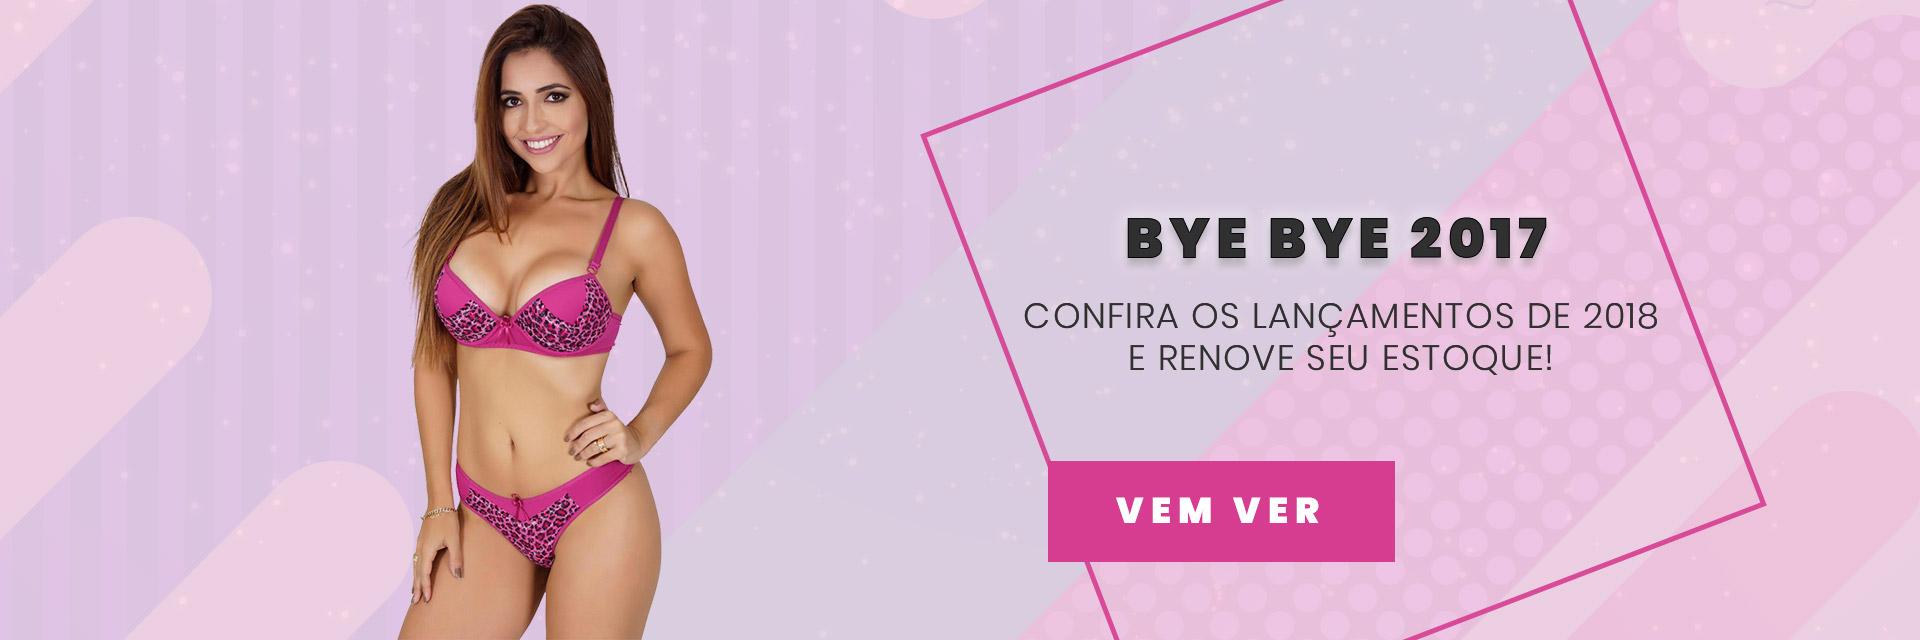 Bye Bye 2017